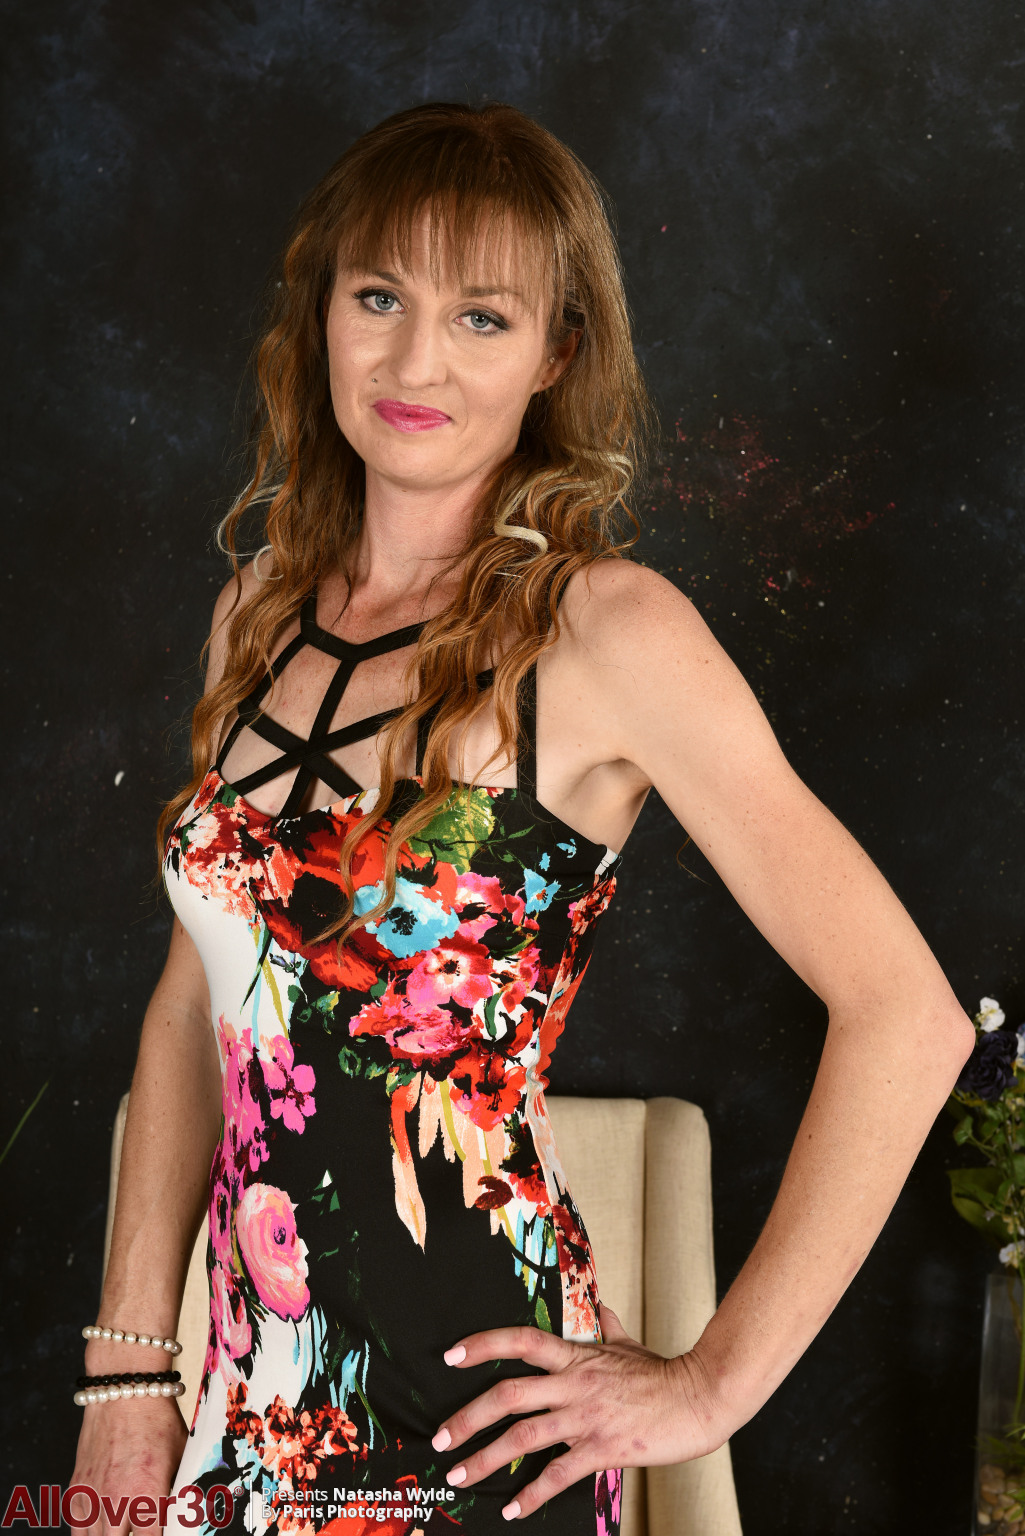 Natasha Wylde from AllOver30